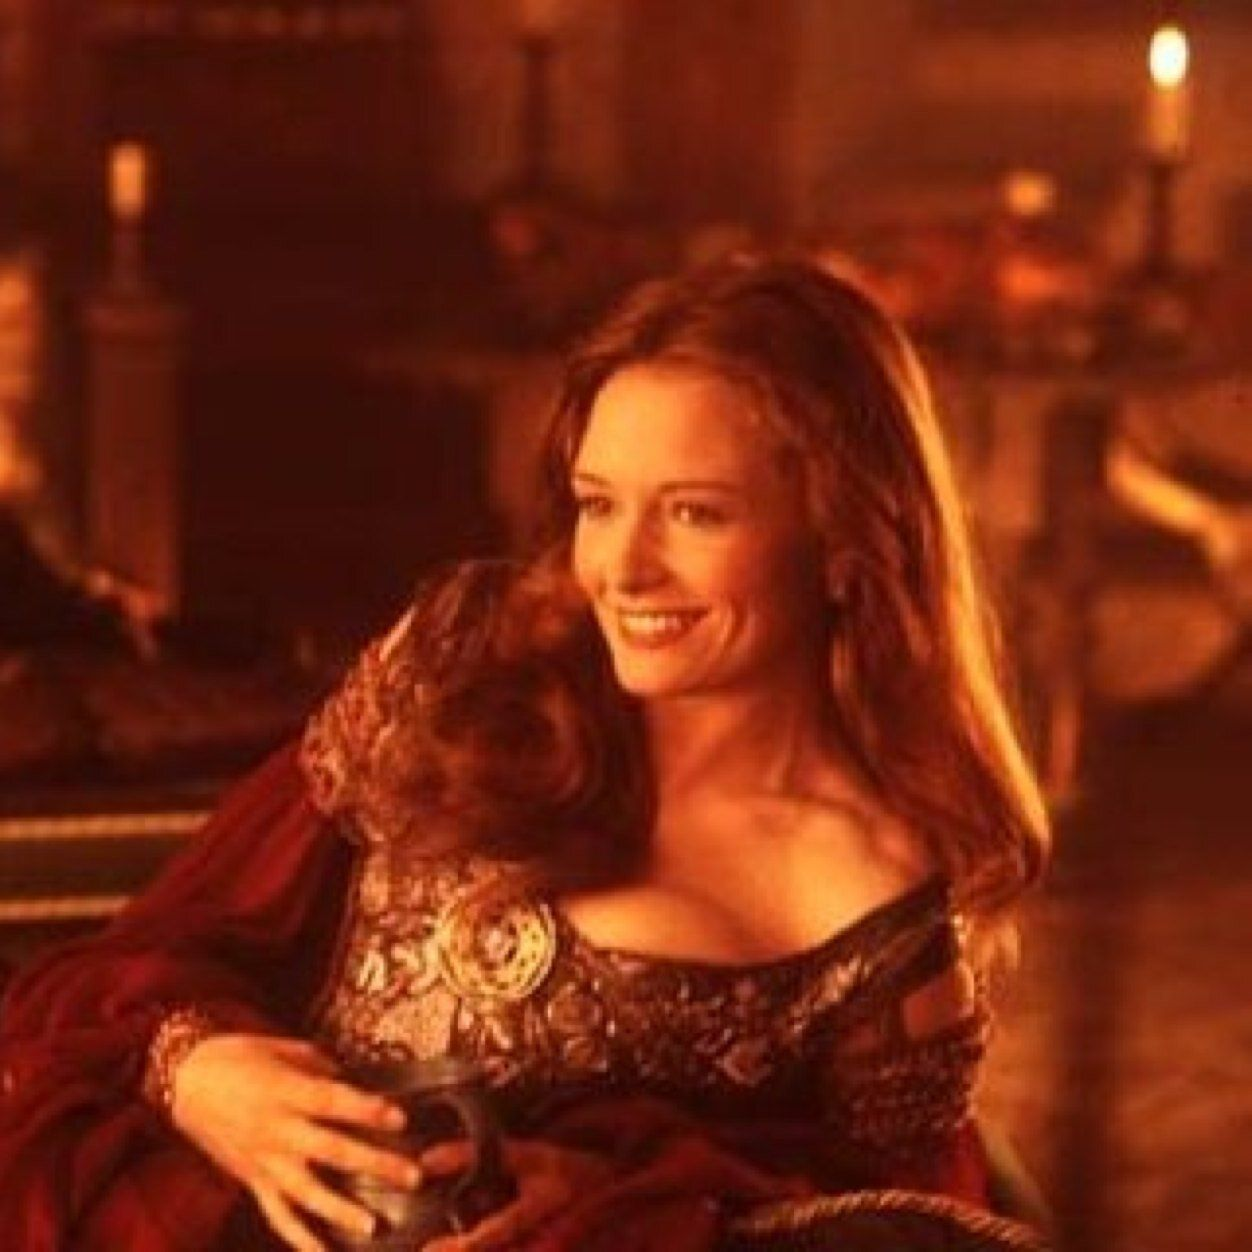 6. Britney Spears Sex movies Fajer Al-Kaisi,Lydia Rose Bewley (born 1985)